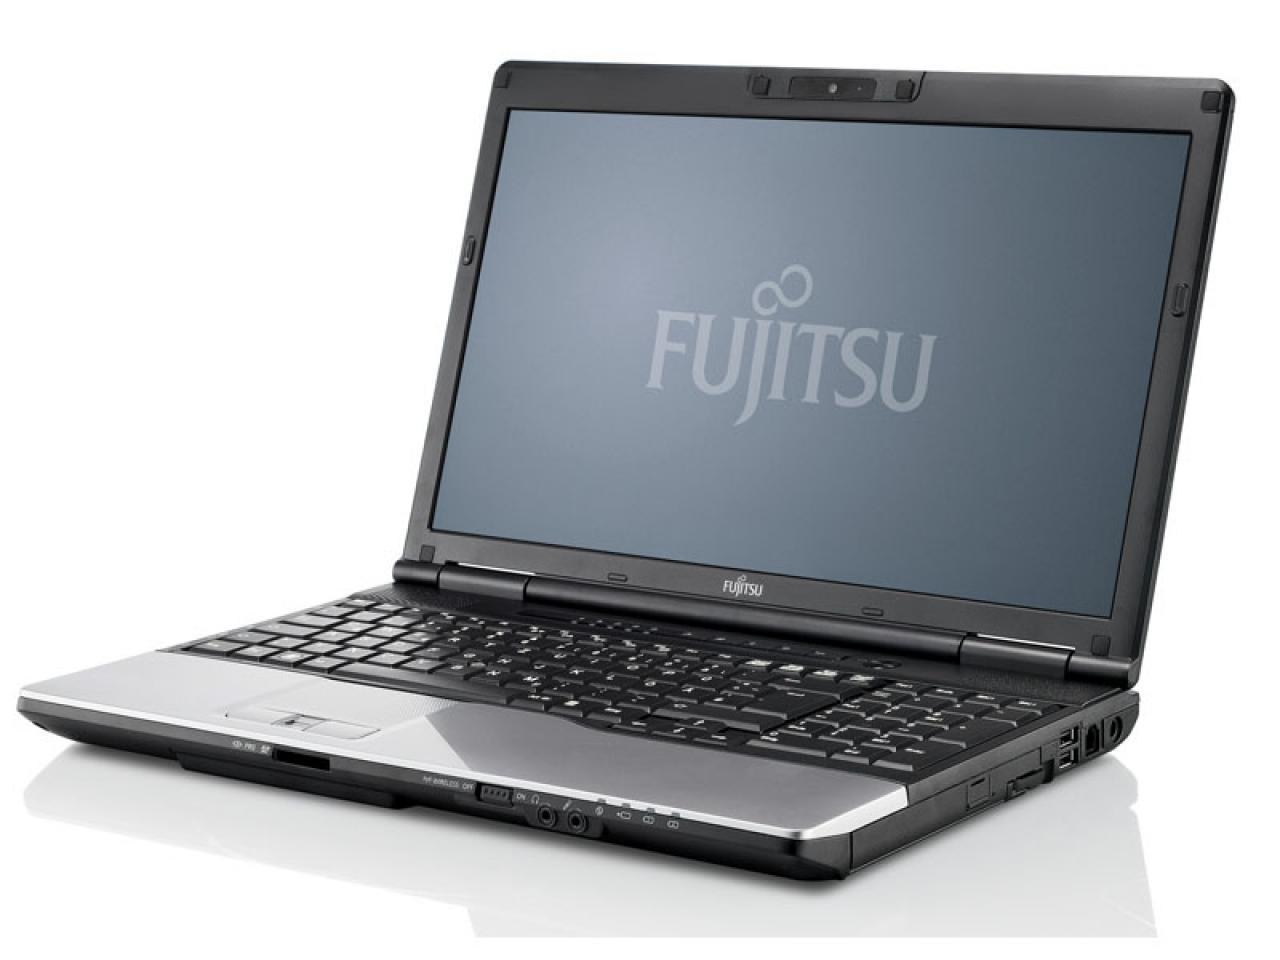 Fujitsu LIFEBOOK E782  - shop.bb-net.de